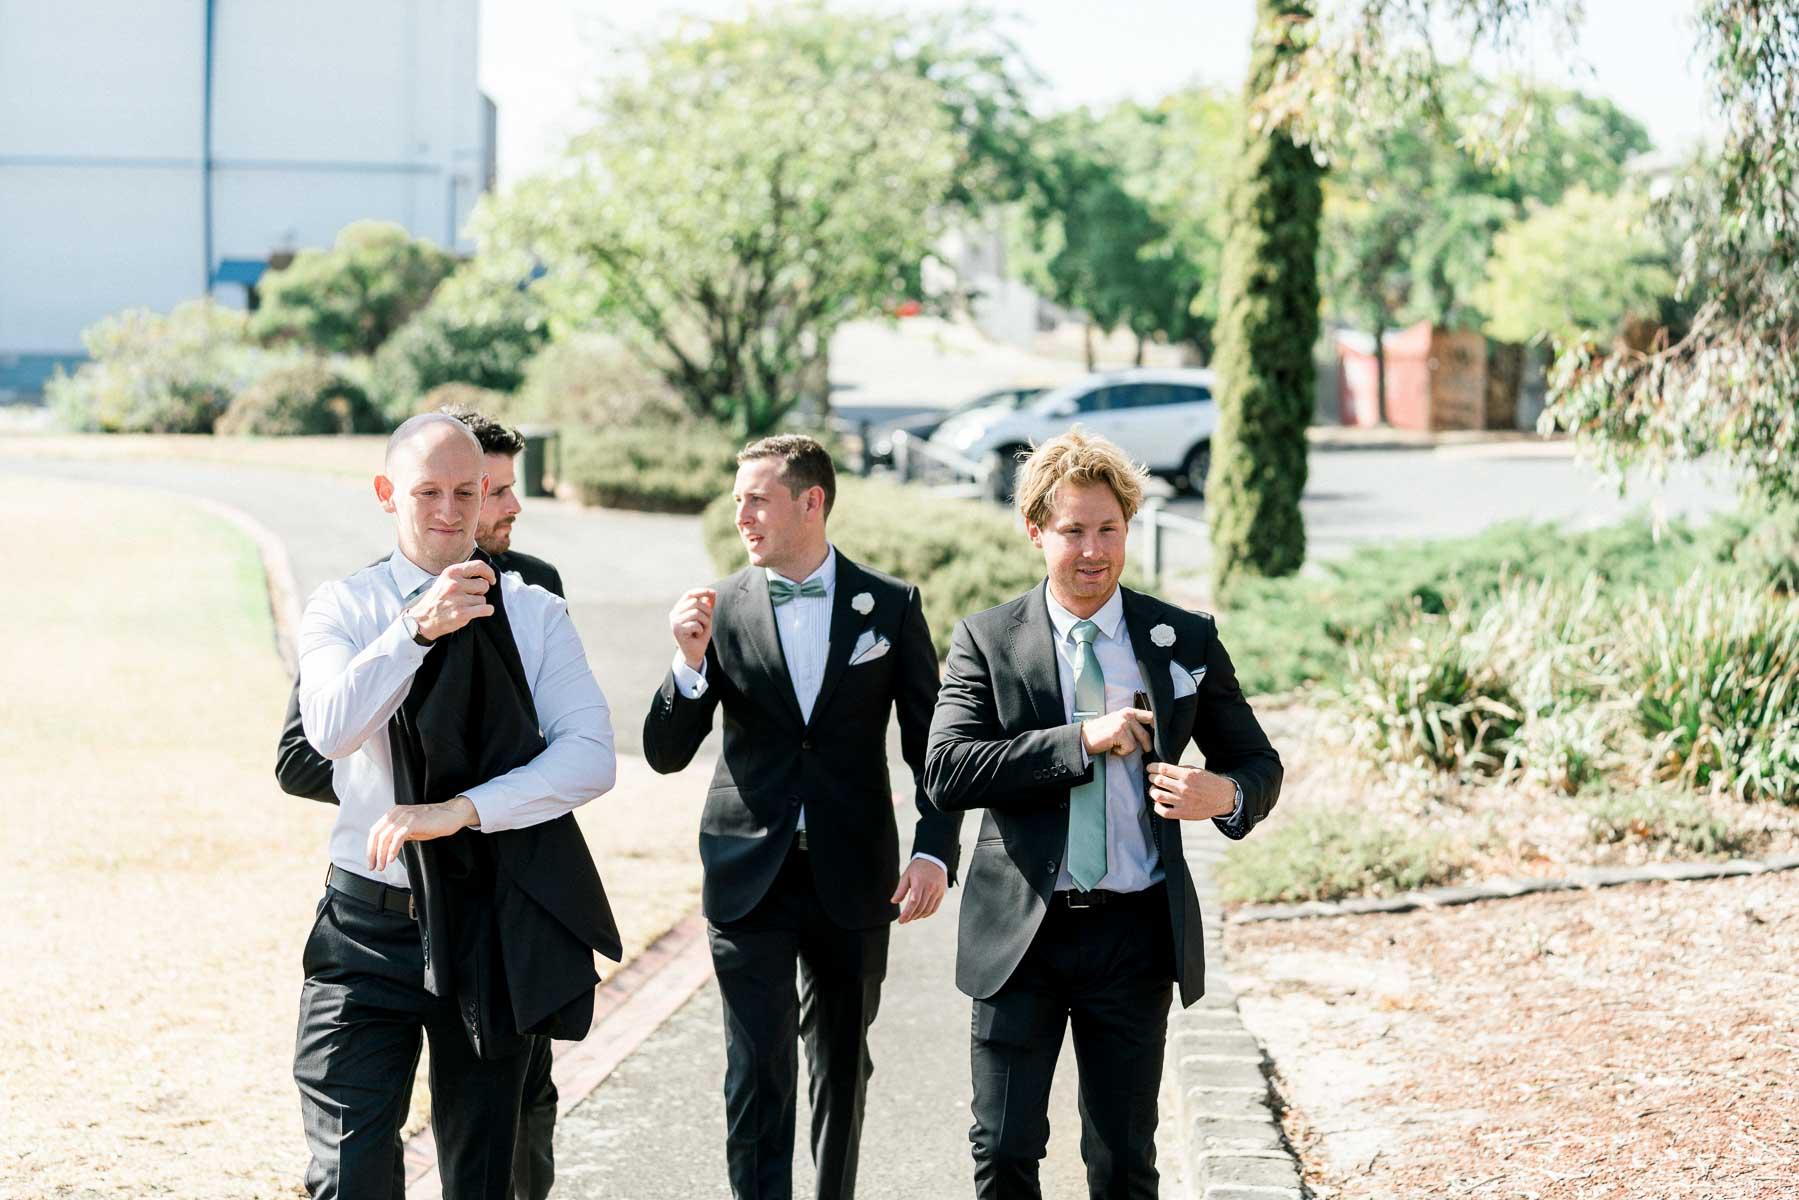 little-henri-cafe-wedding-thornbury-heart+soul-weddings-jane-aaron-05097.jpg